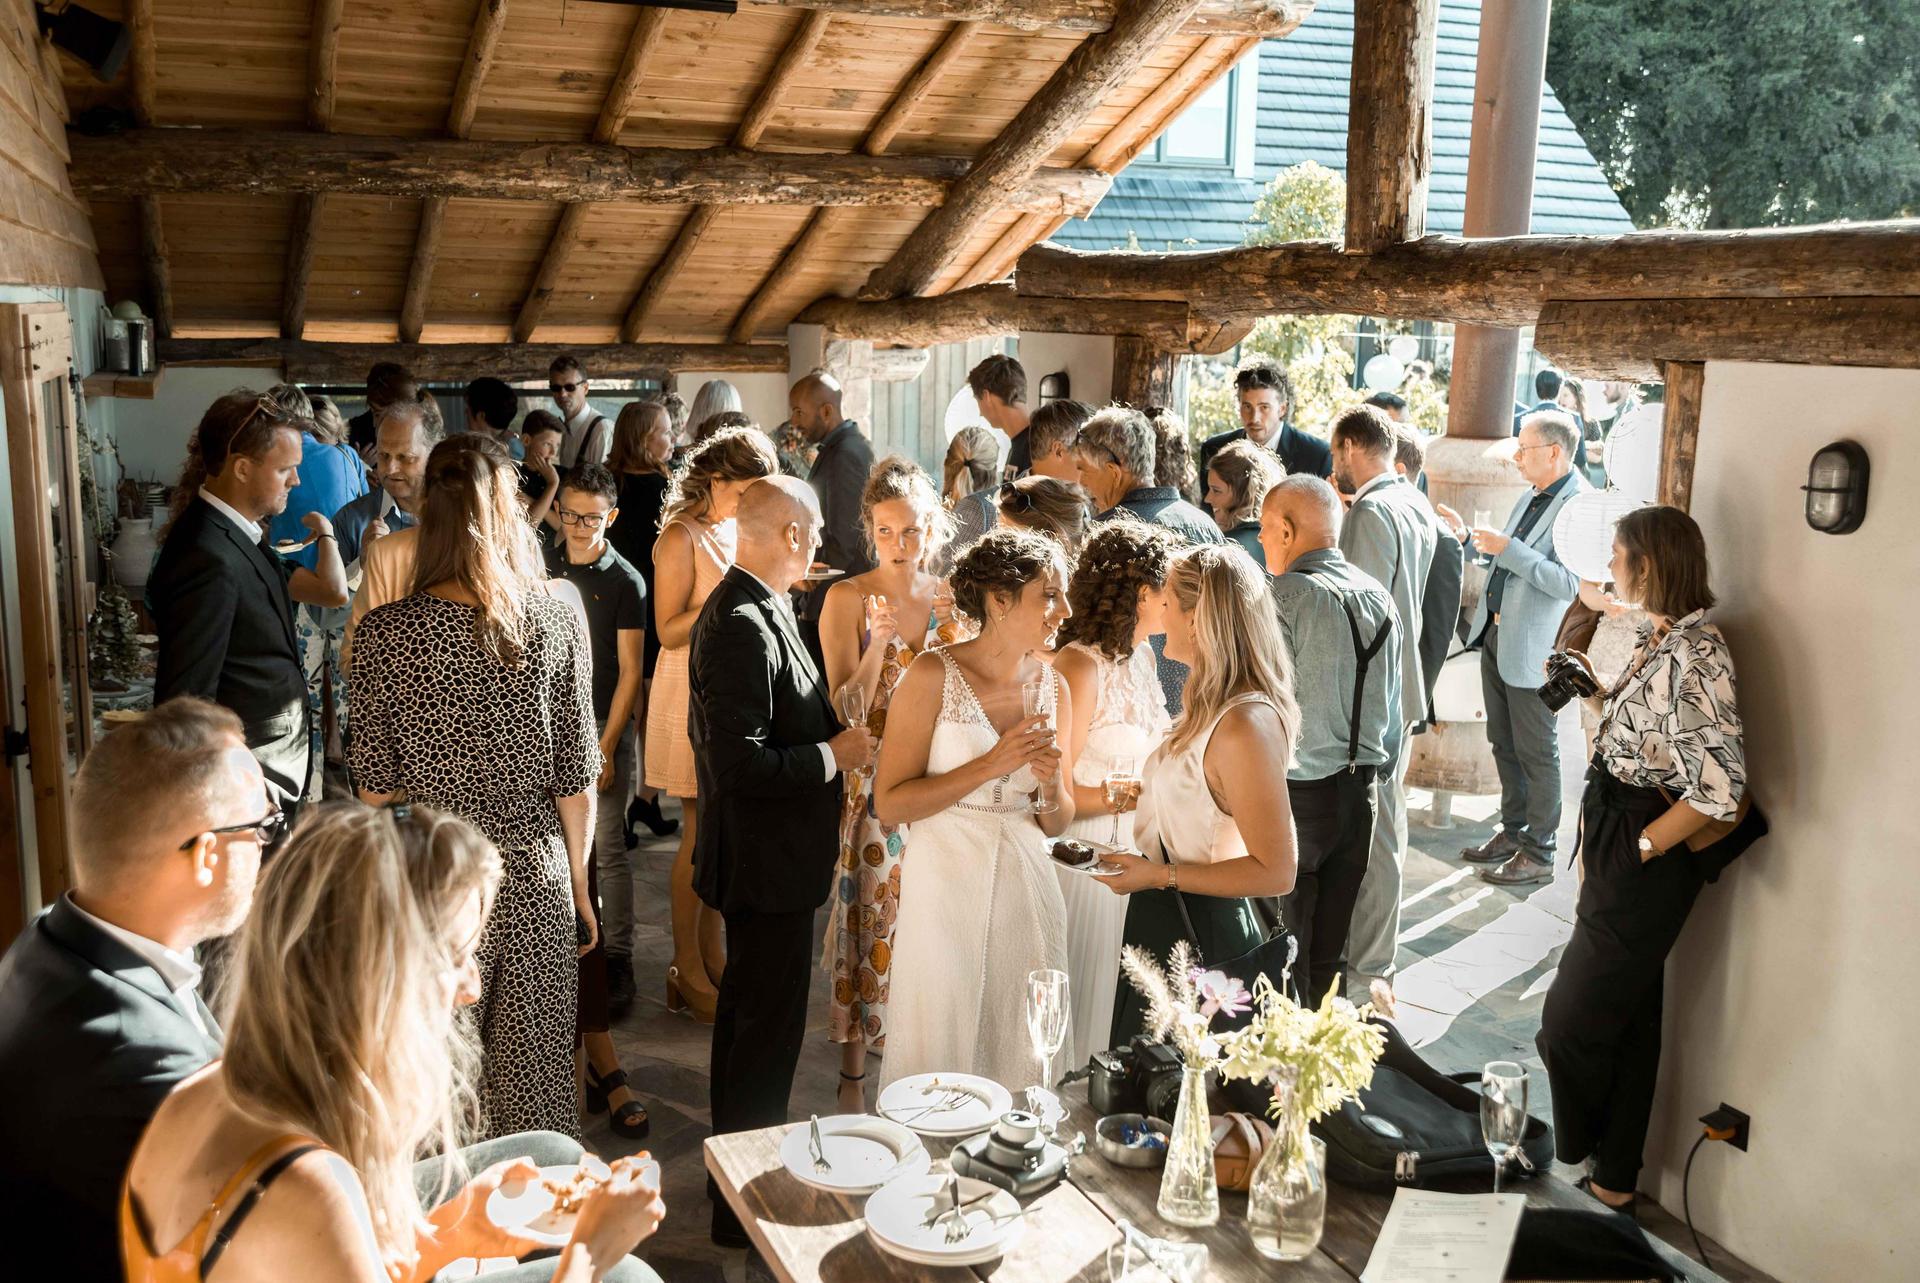 Bruiloft klein website -6-2.jpg